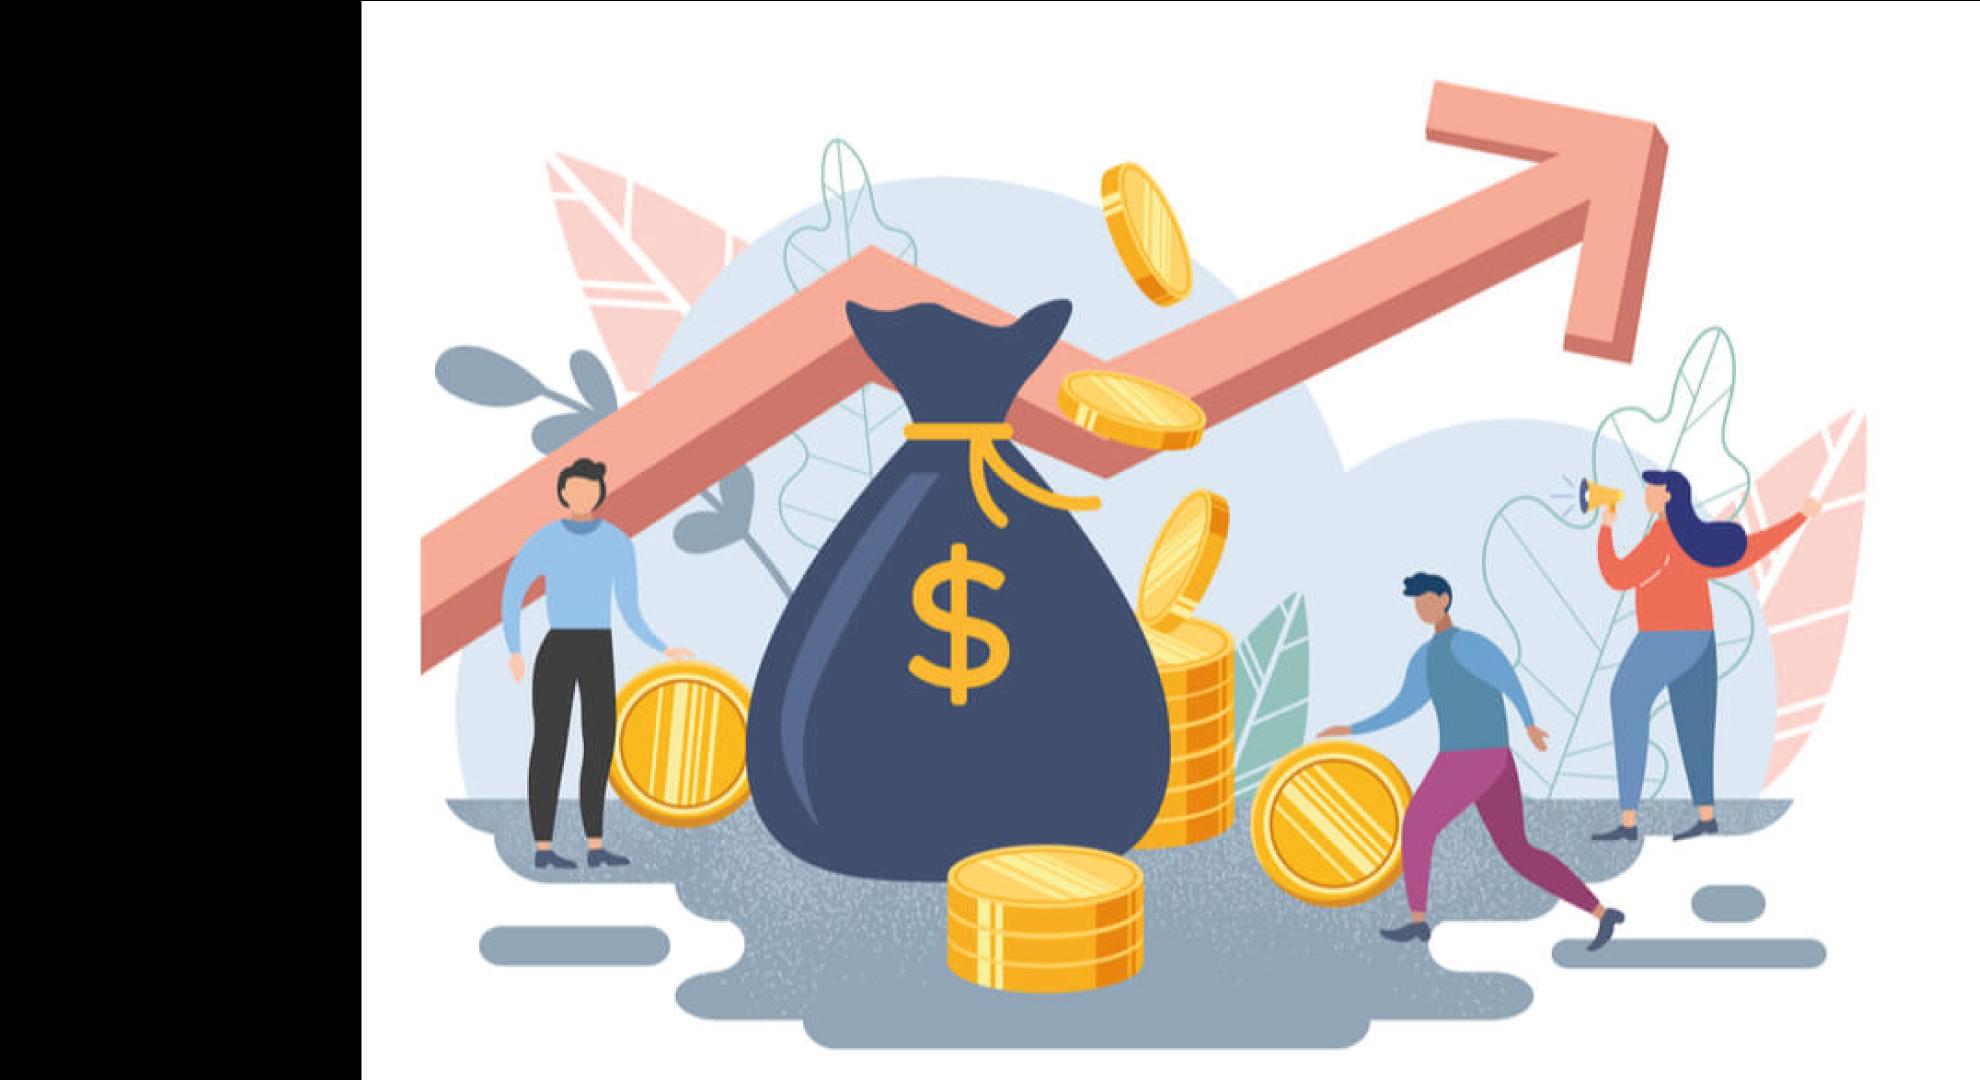 Amazon-FBA-The-Ultimate-Guide-to-Making-Money-on-Amazon